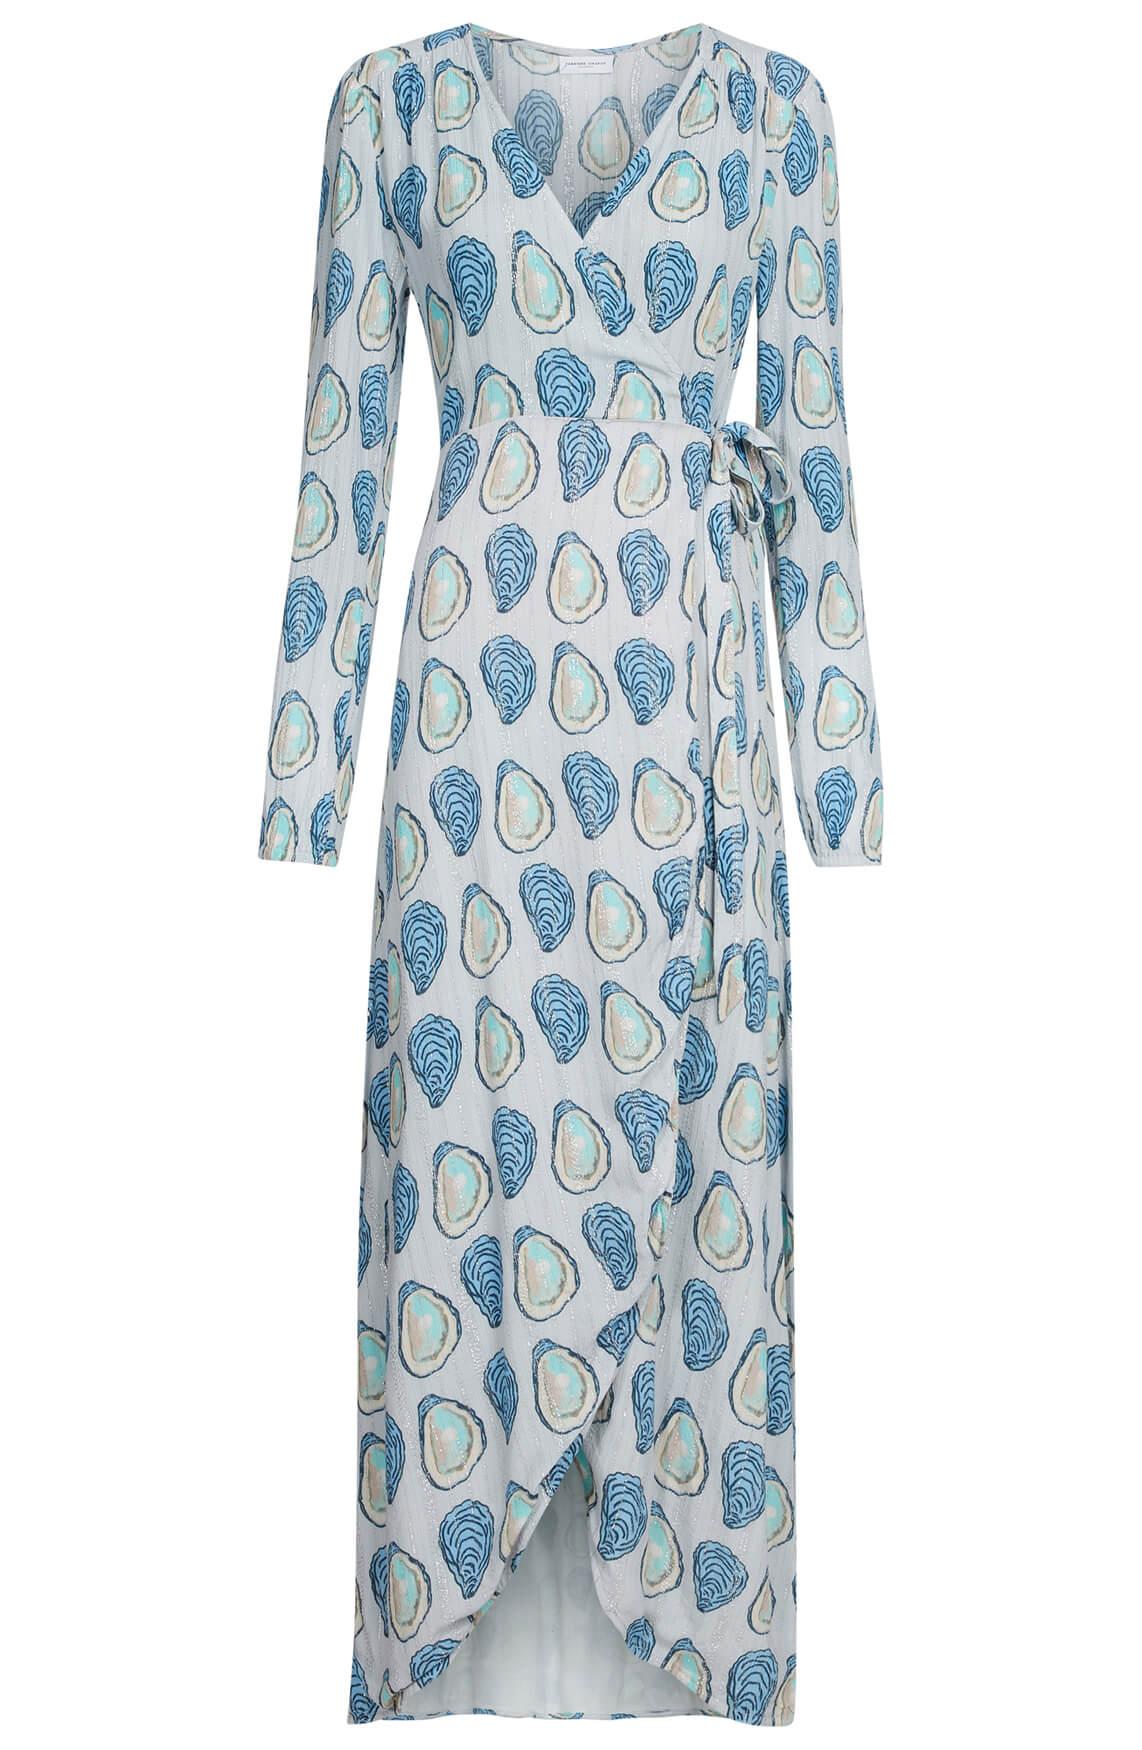 Fabienne Chapot Dames Natasja Nicola jurk Blauw